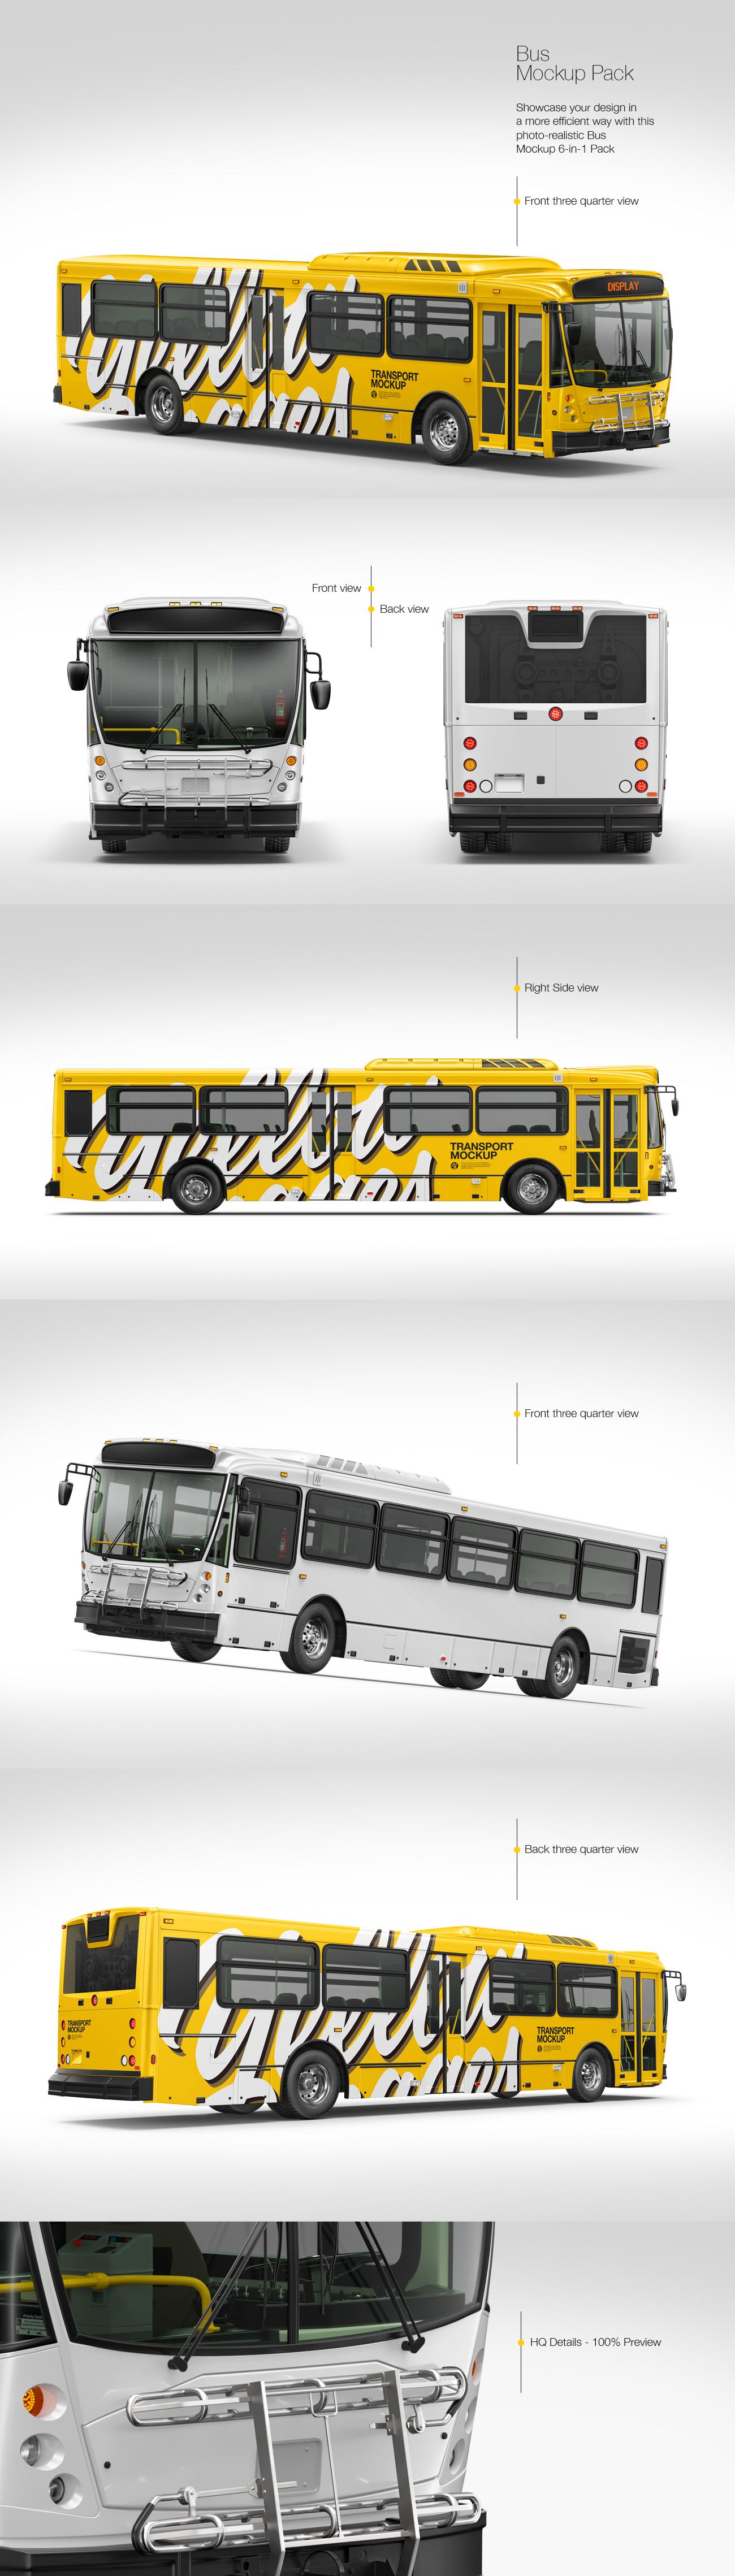 Bus Mockup Pack